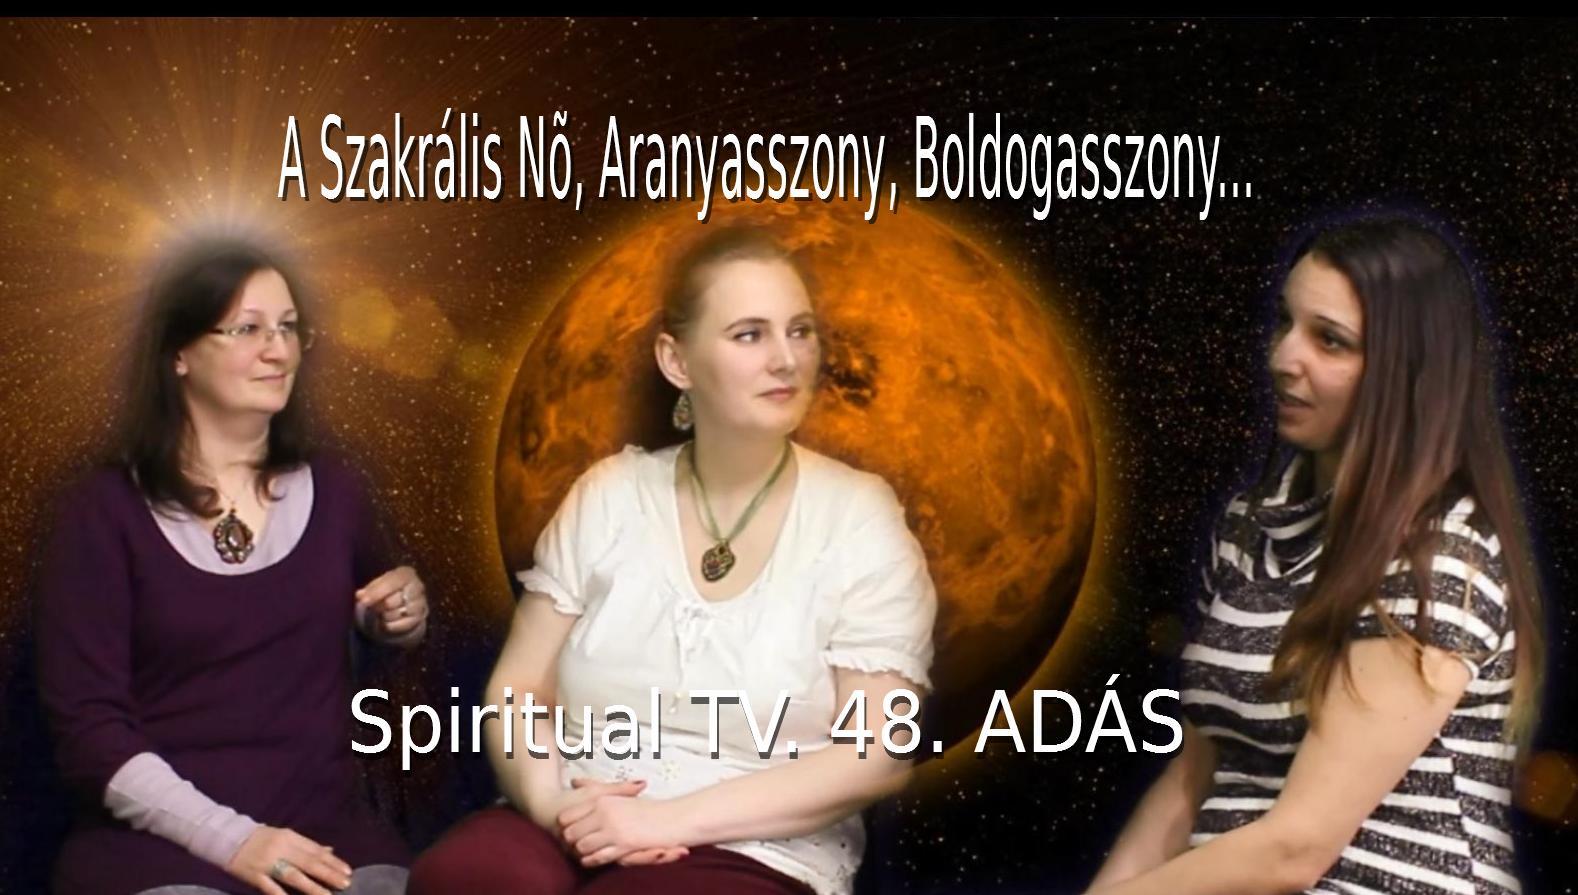 2018.02.25.                                   Heffner Attila,Gyebrovszki Ilona,                                   Heffnerné Szomorkai Judit, Keczen                                   Izabella Mária